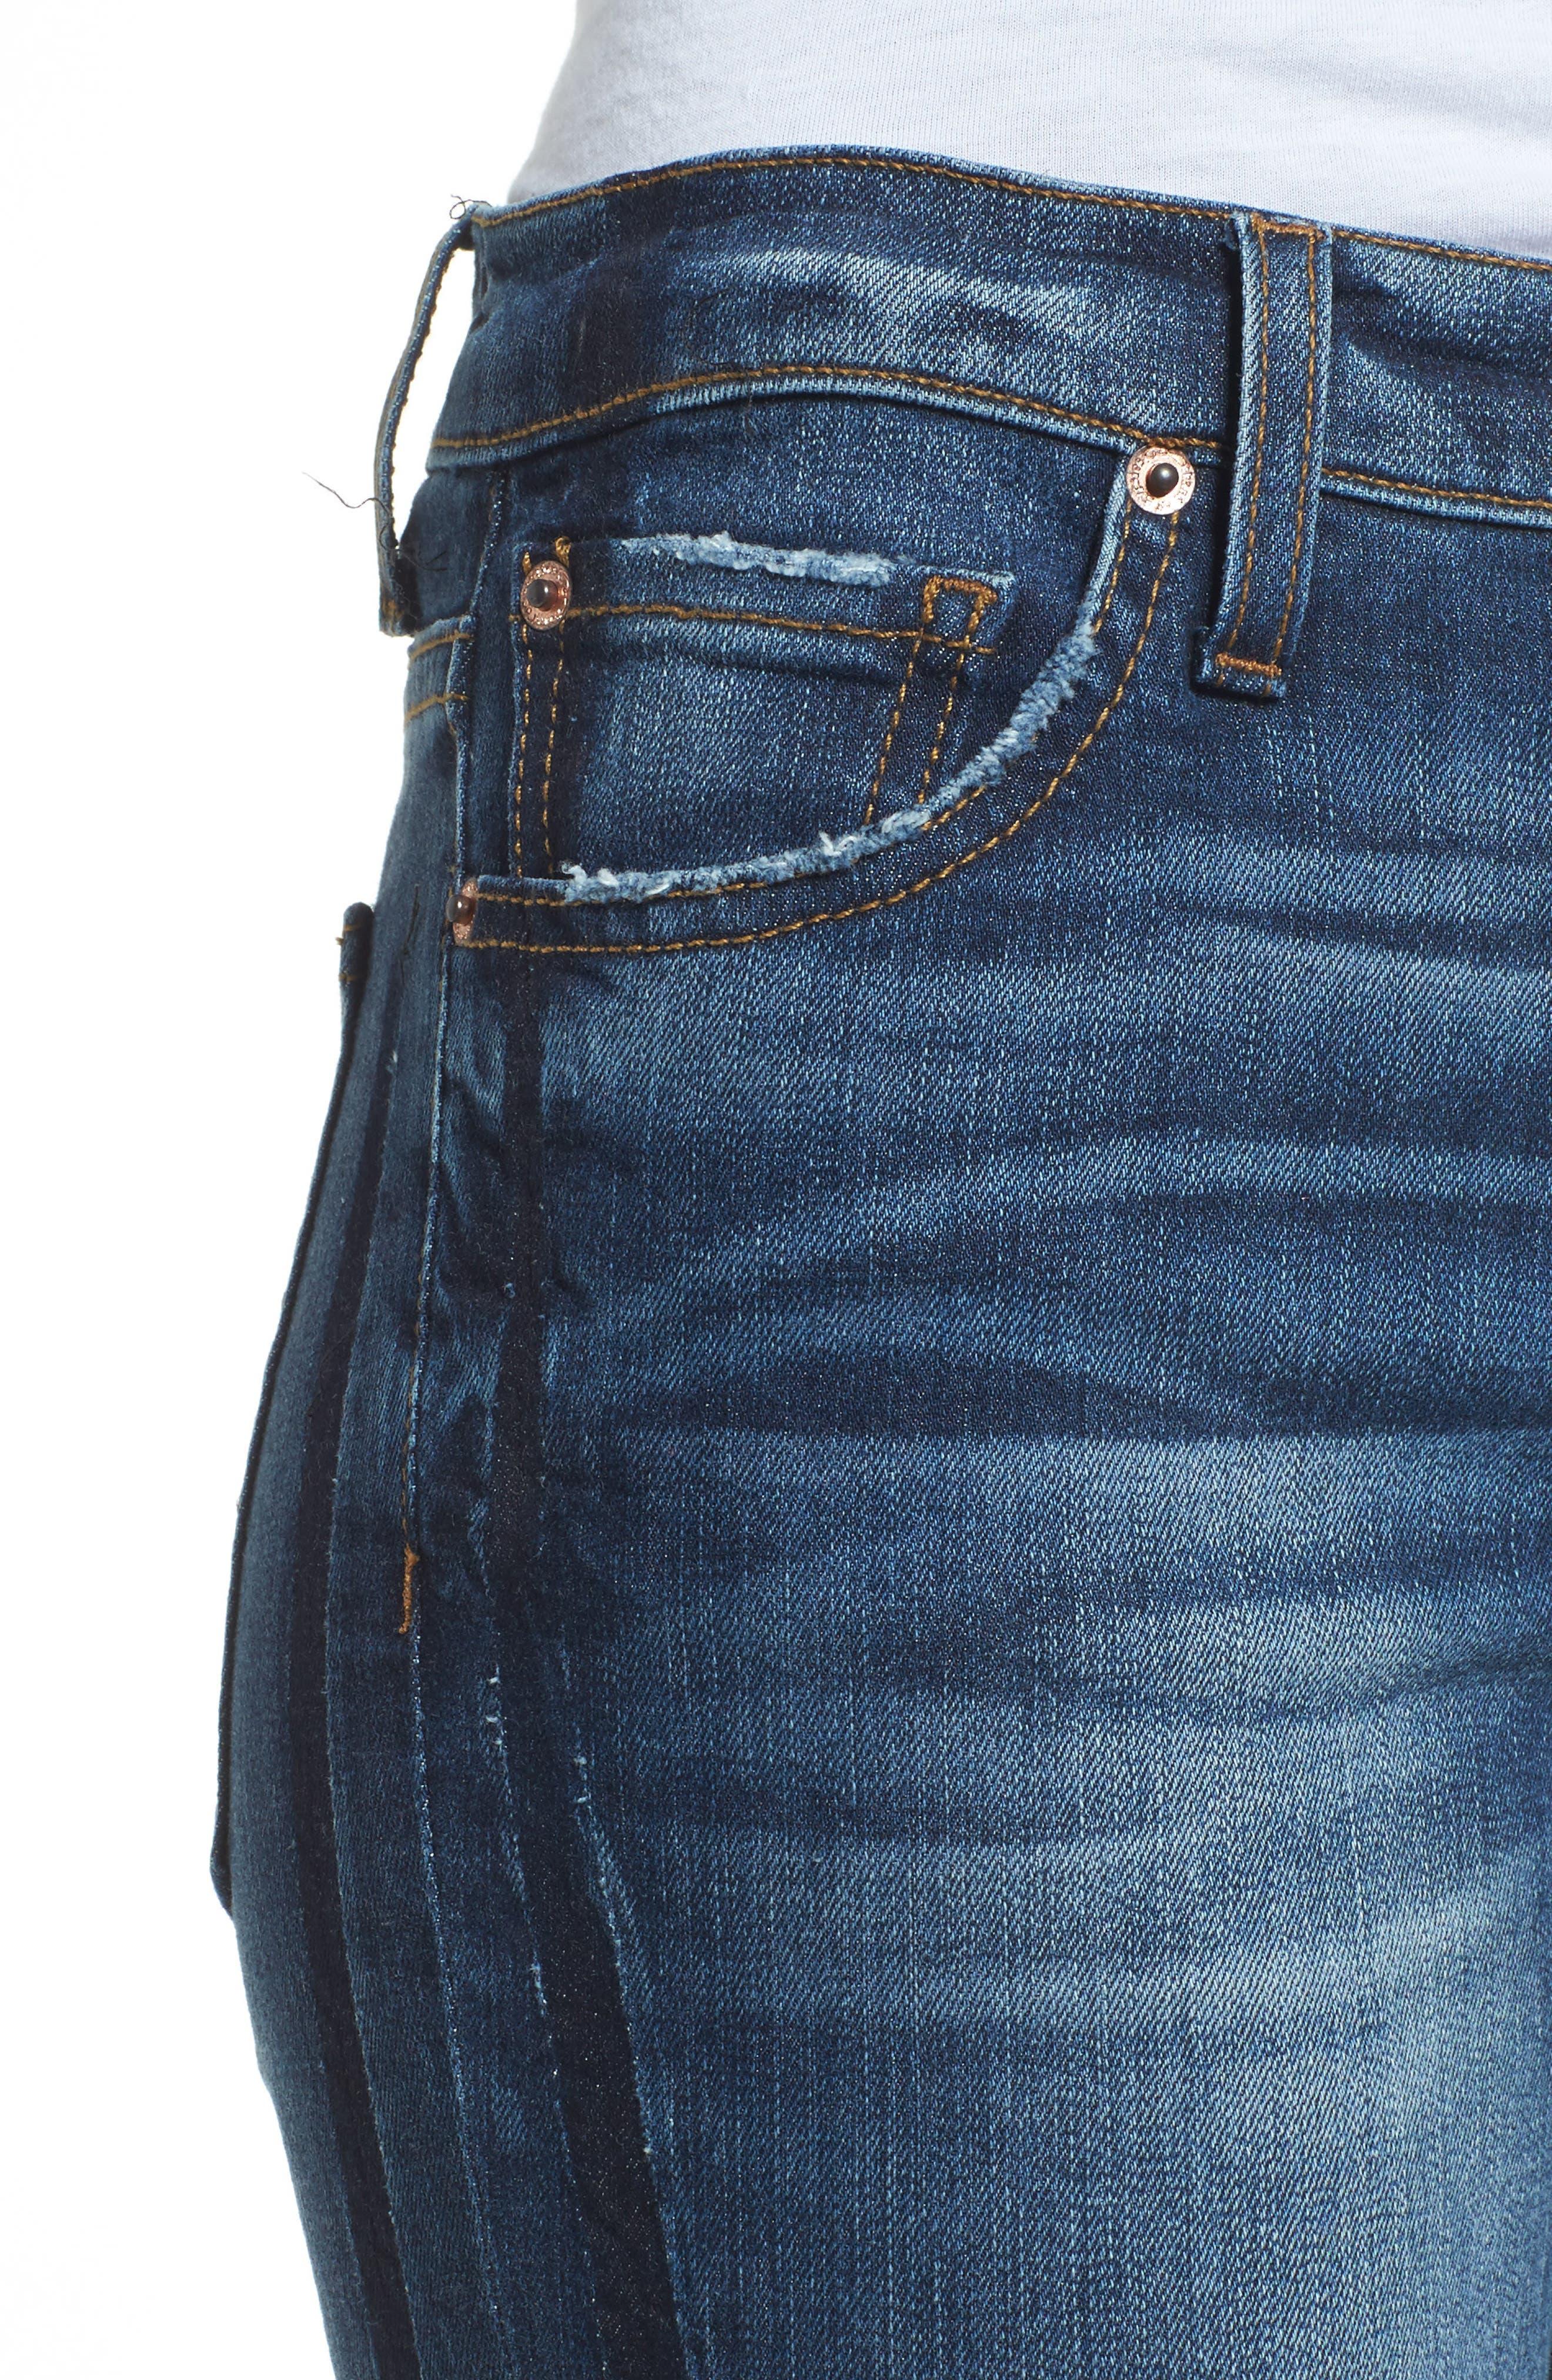 Lola Ripped Skinny Jeans,                             Alternate thumbnail 4, color,                             400